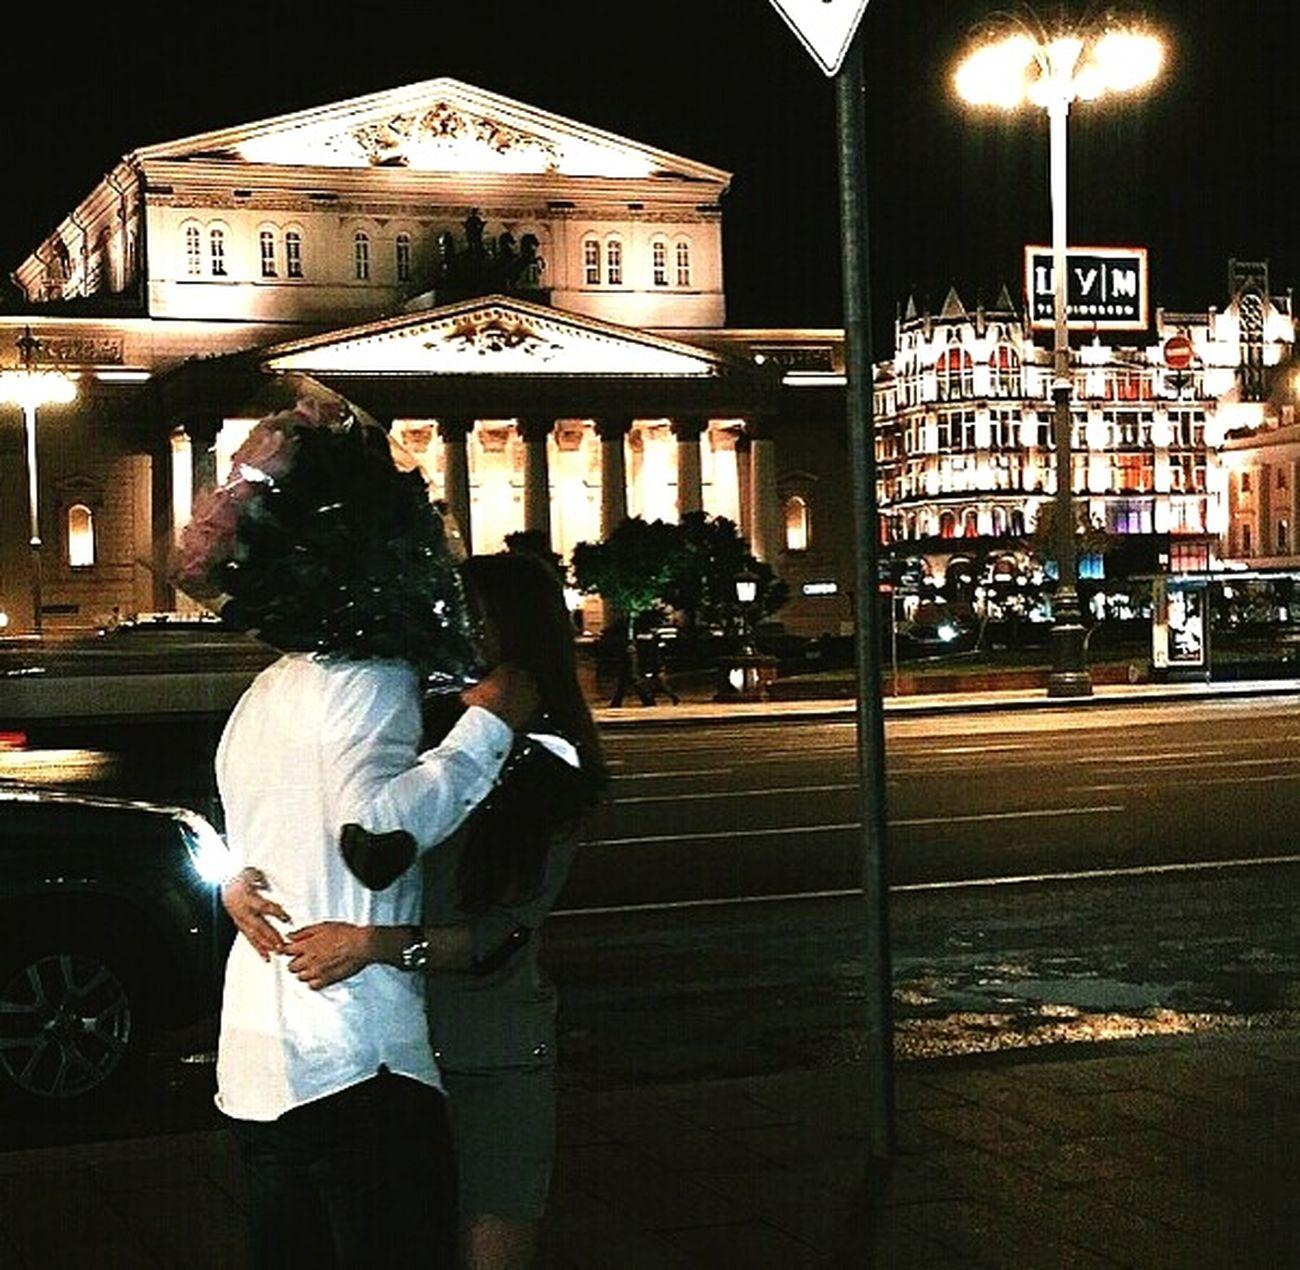 😊🐰💕☝💖💟💞 Night City Urban Skyline Myboy💕 Moscow City Lifestyles Happiness Summer Walk Nightlife 2years9month Love ♥ Flowers Sweet♡ First Eyeem Photo Kiss